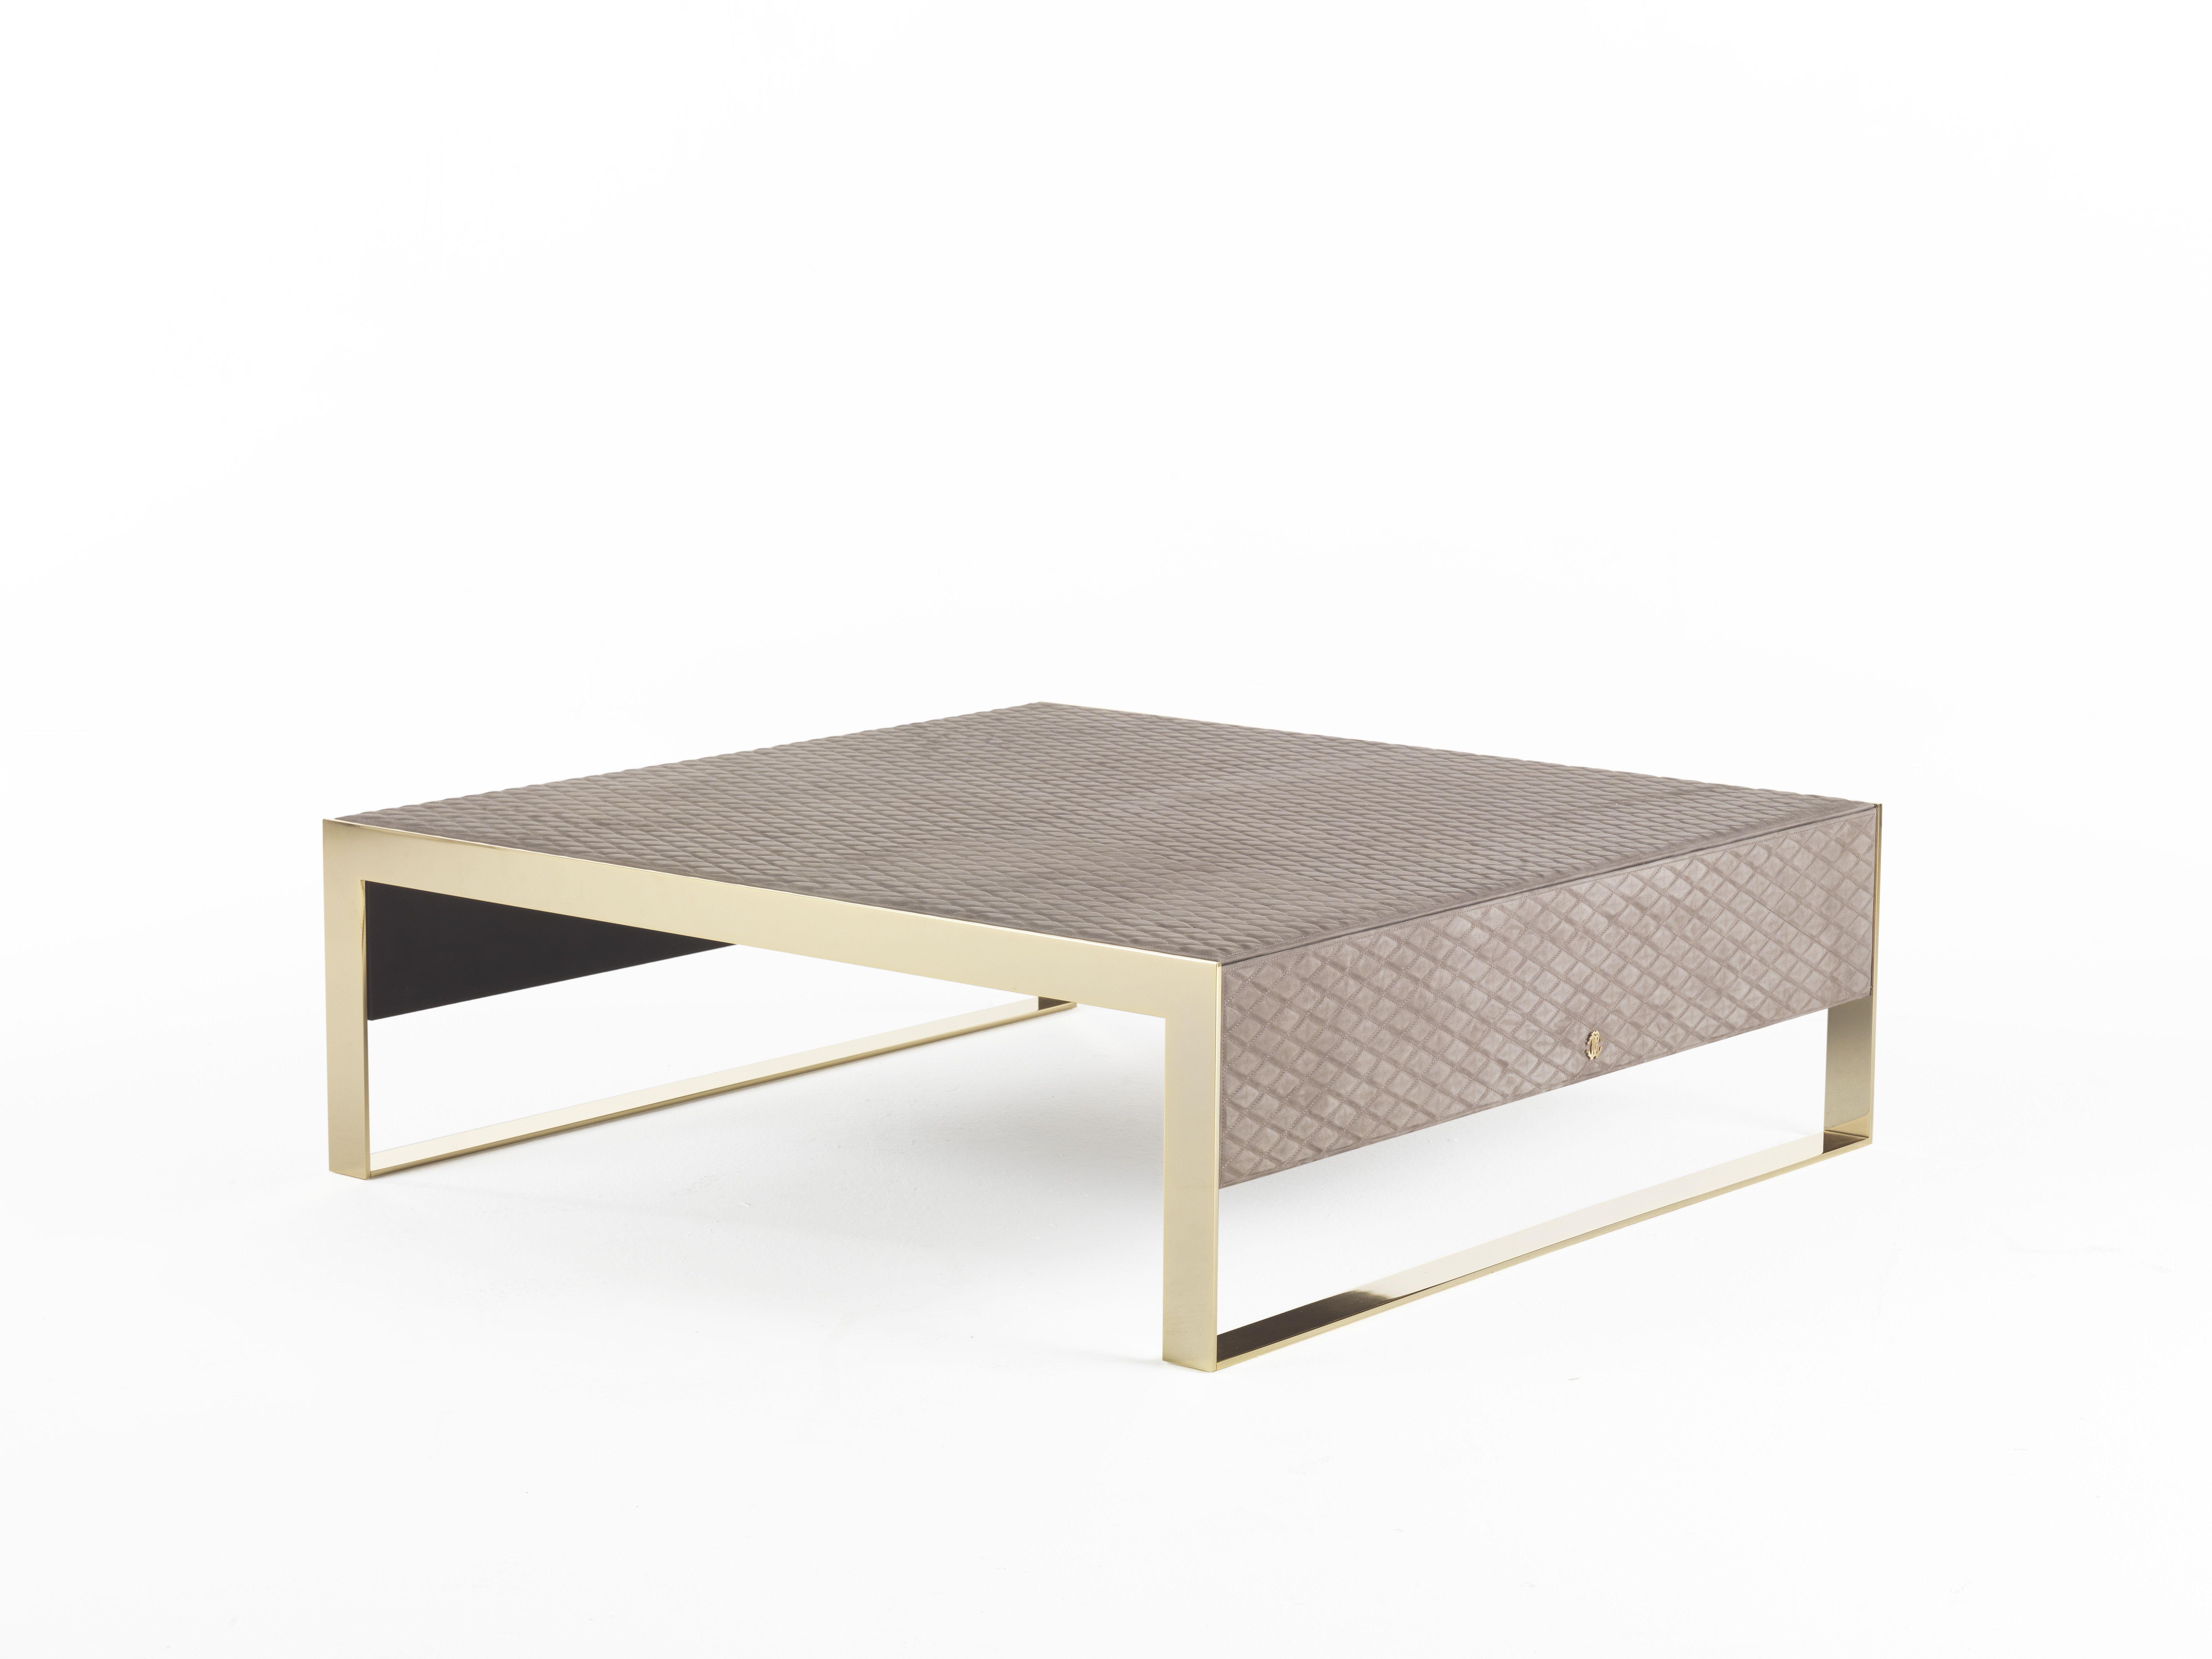 Golden Bridge Sahara Coffee Table Set Kings Of Chelsea Coffee Table Furniture Dining Sofa [ 5412 x 7216 Pixel ]